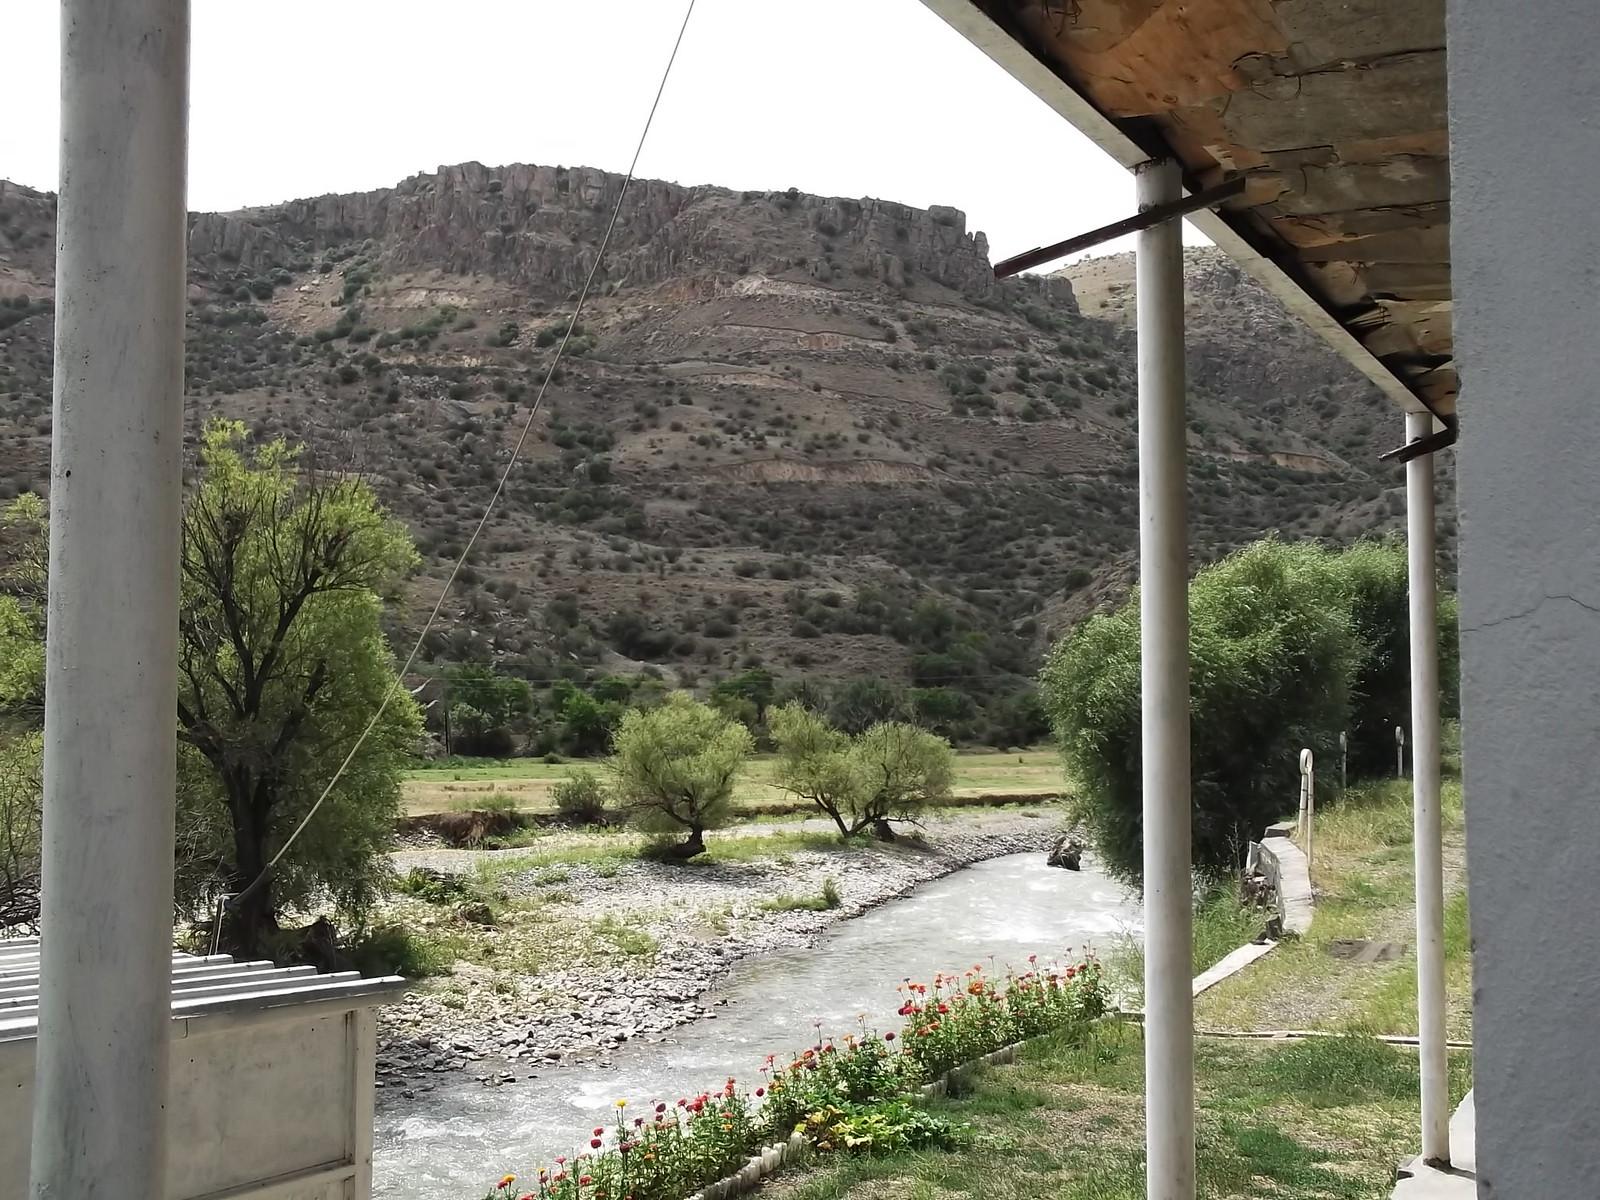 iran 1104